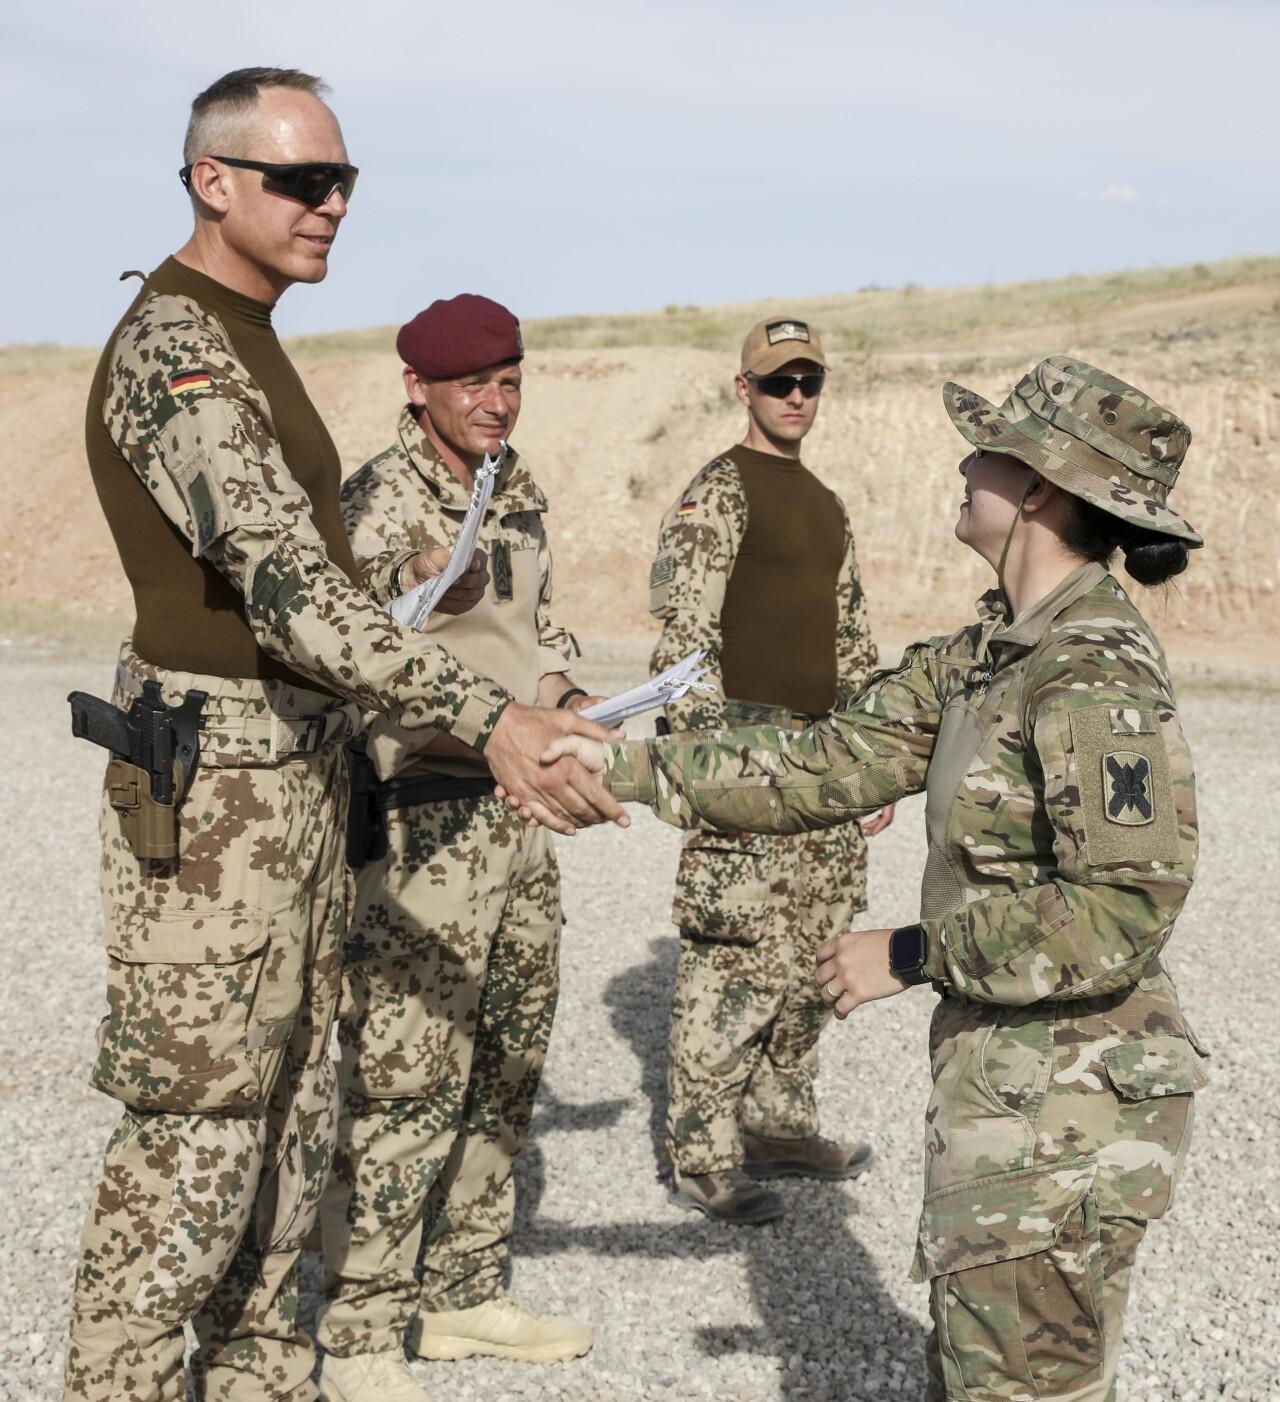 U.S. Army National Guard photo by Staff Sgt. Noshoba Davis